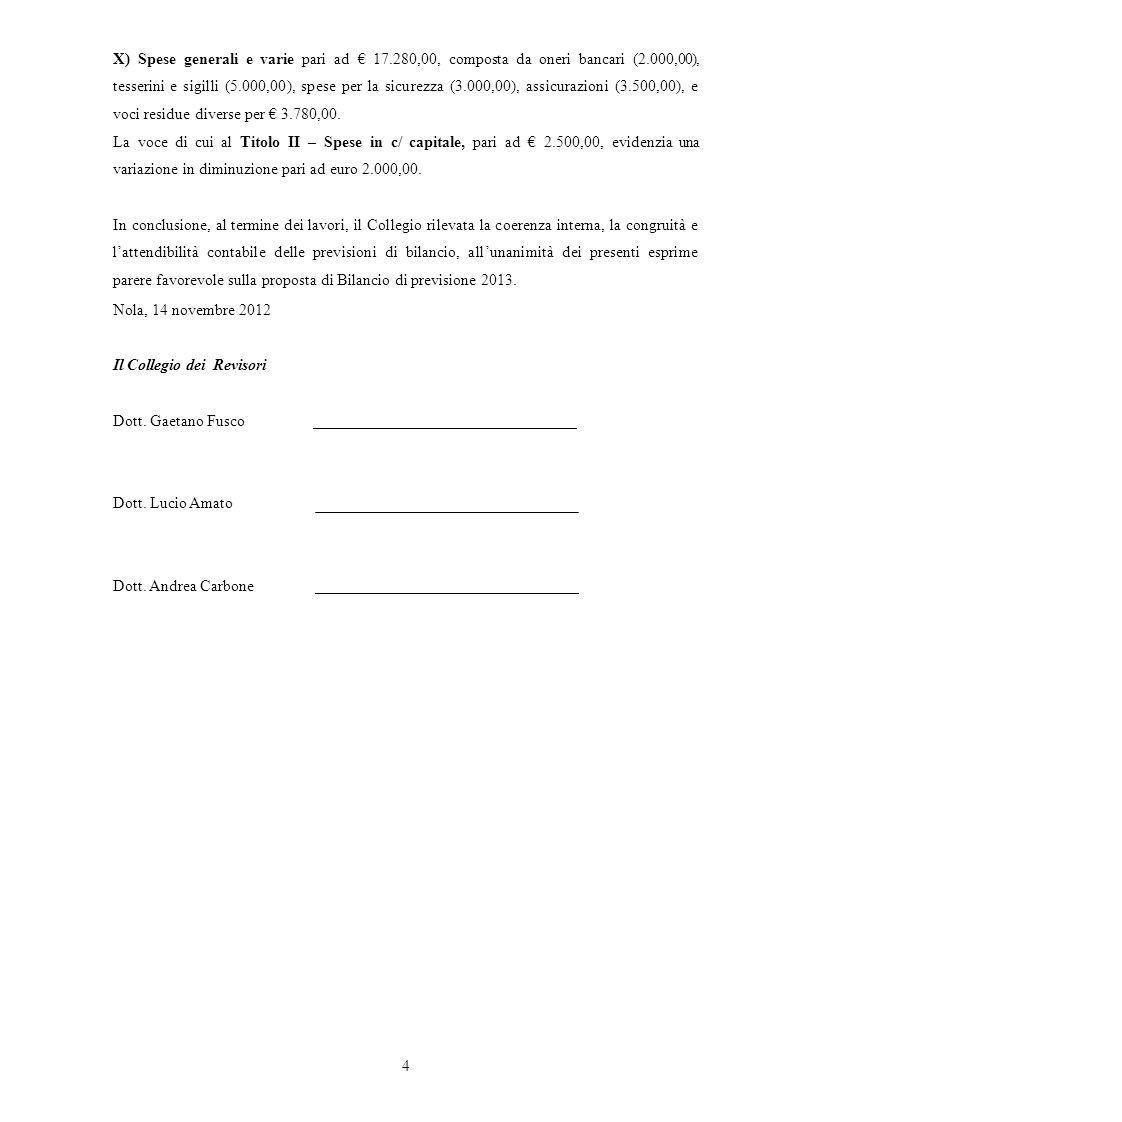 X) Spese generali e varie pari ad € 17